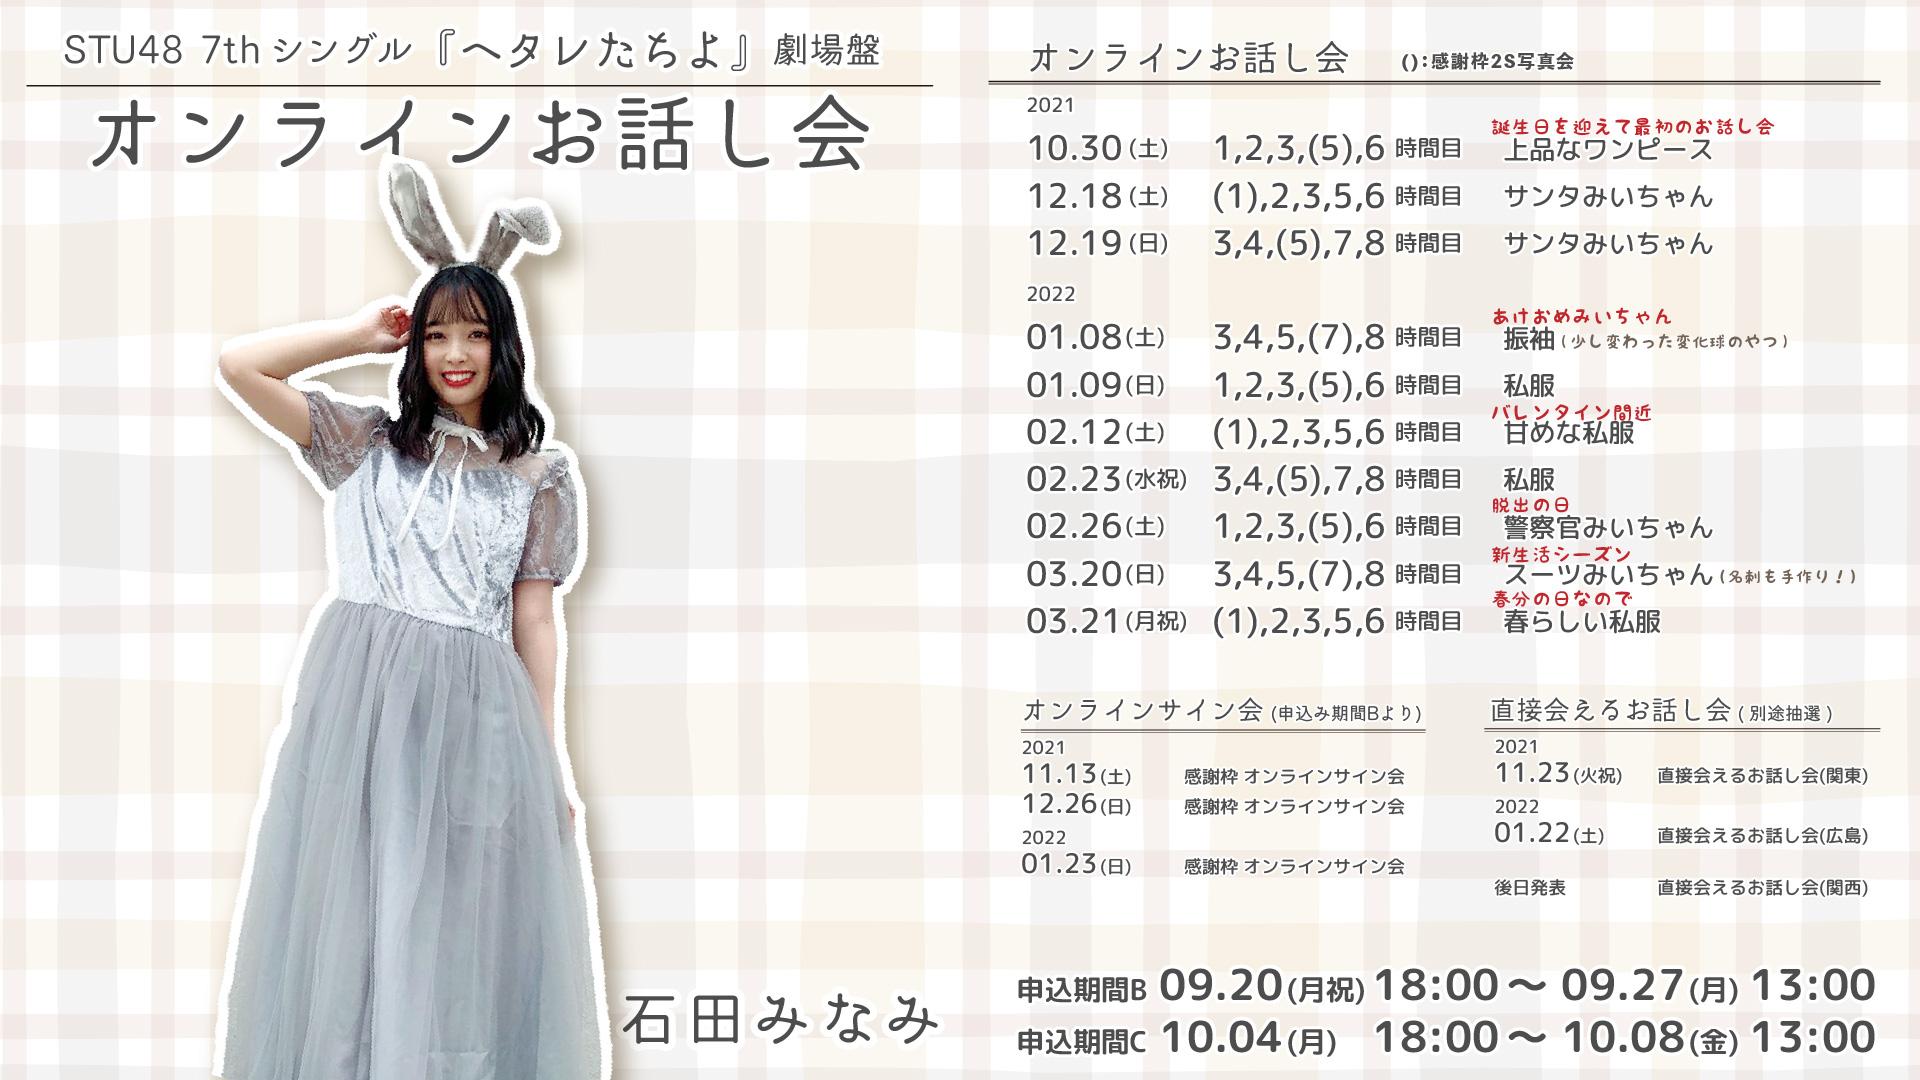 STU48 7th「ヘタレたちよ」オンラインお話し会